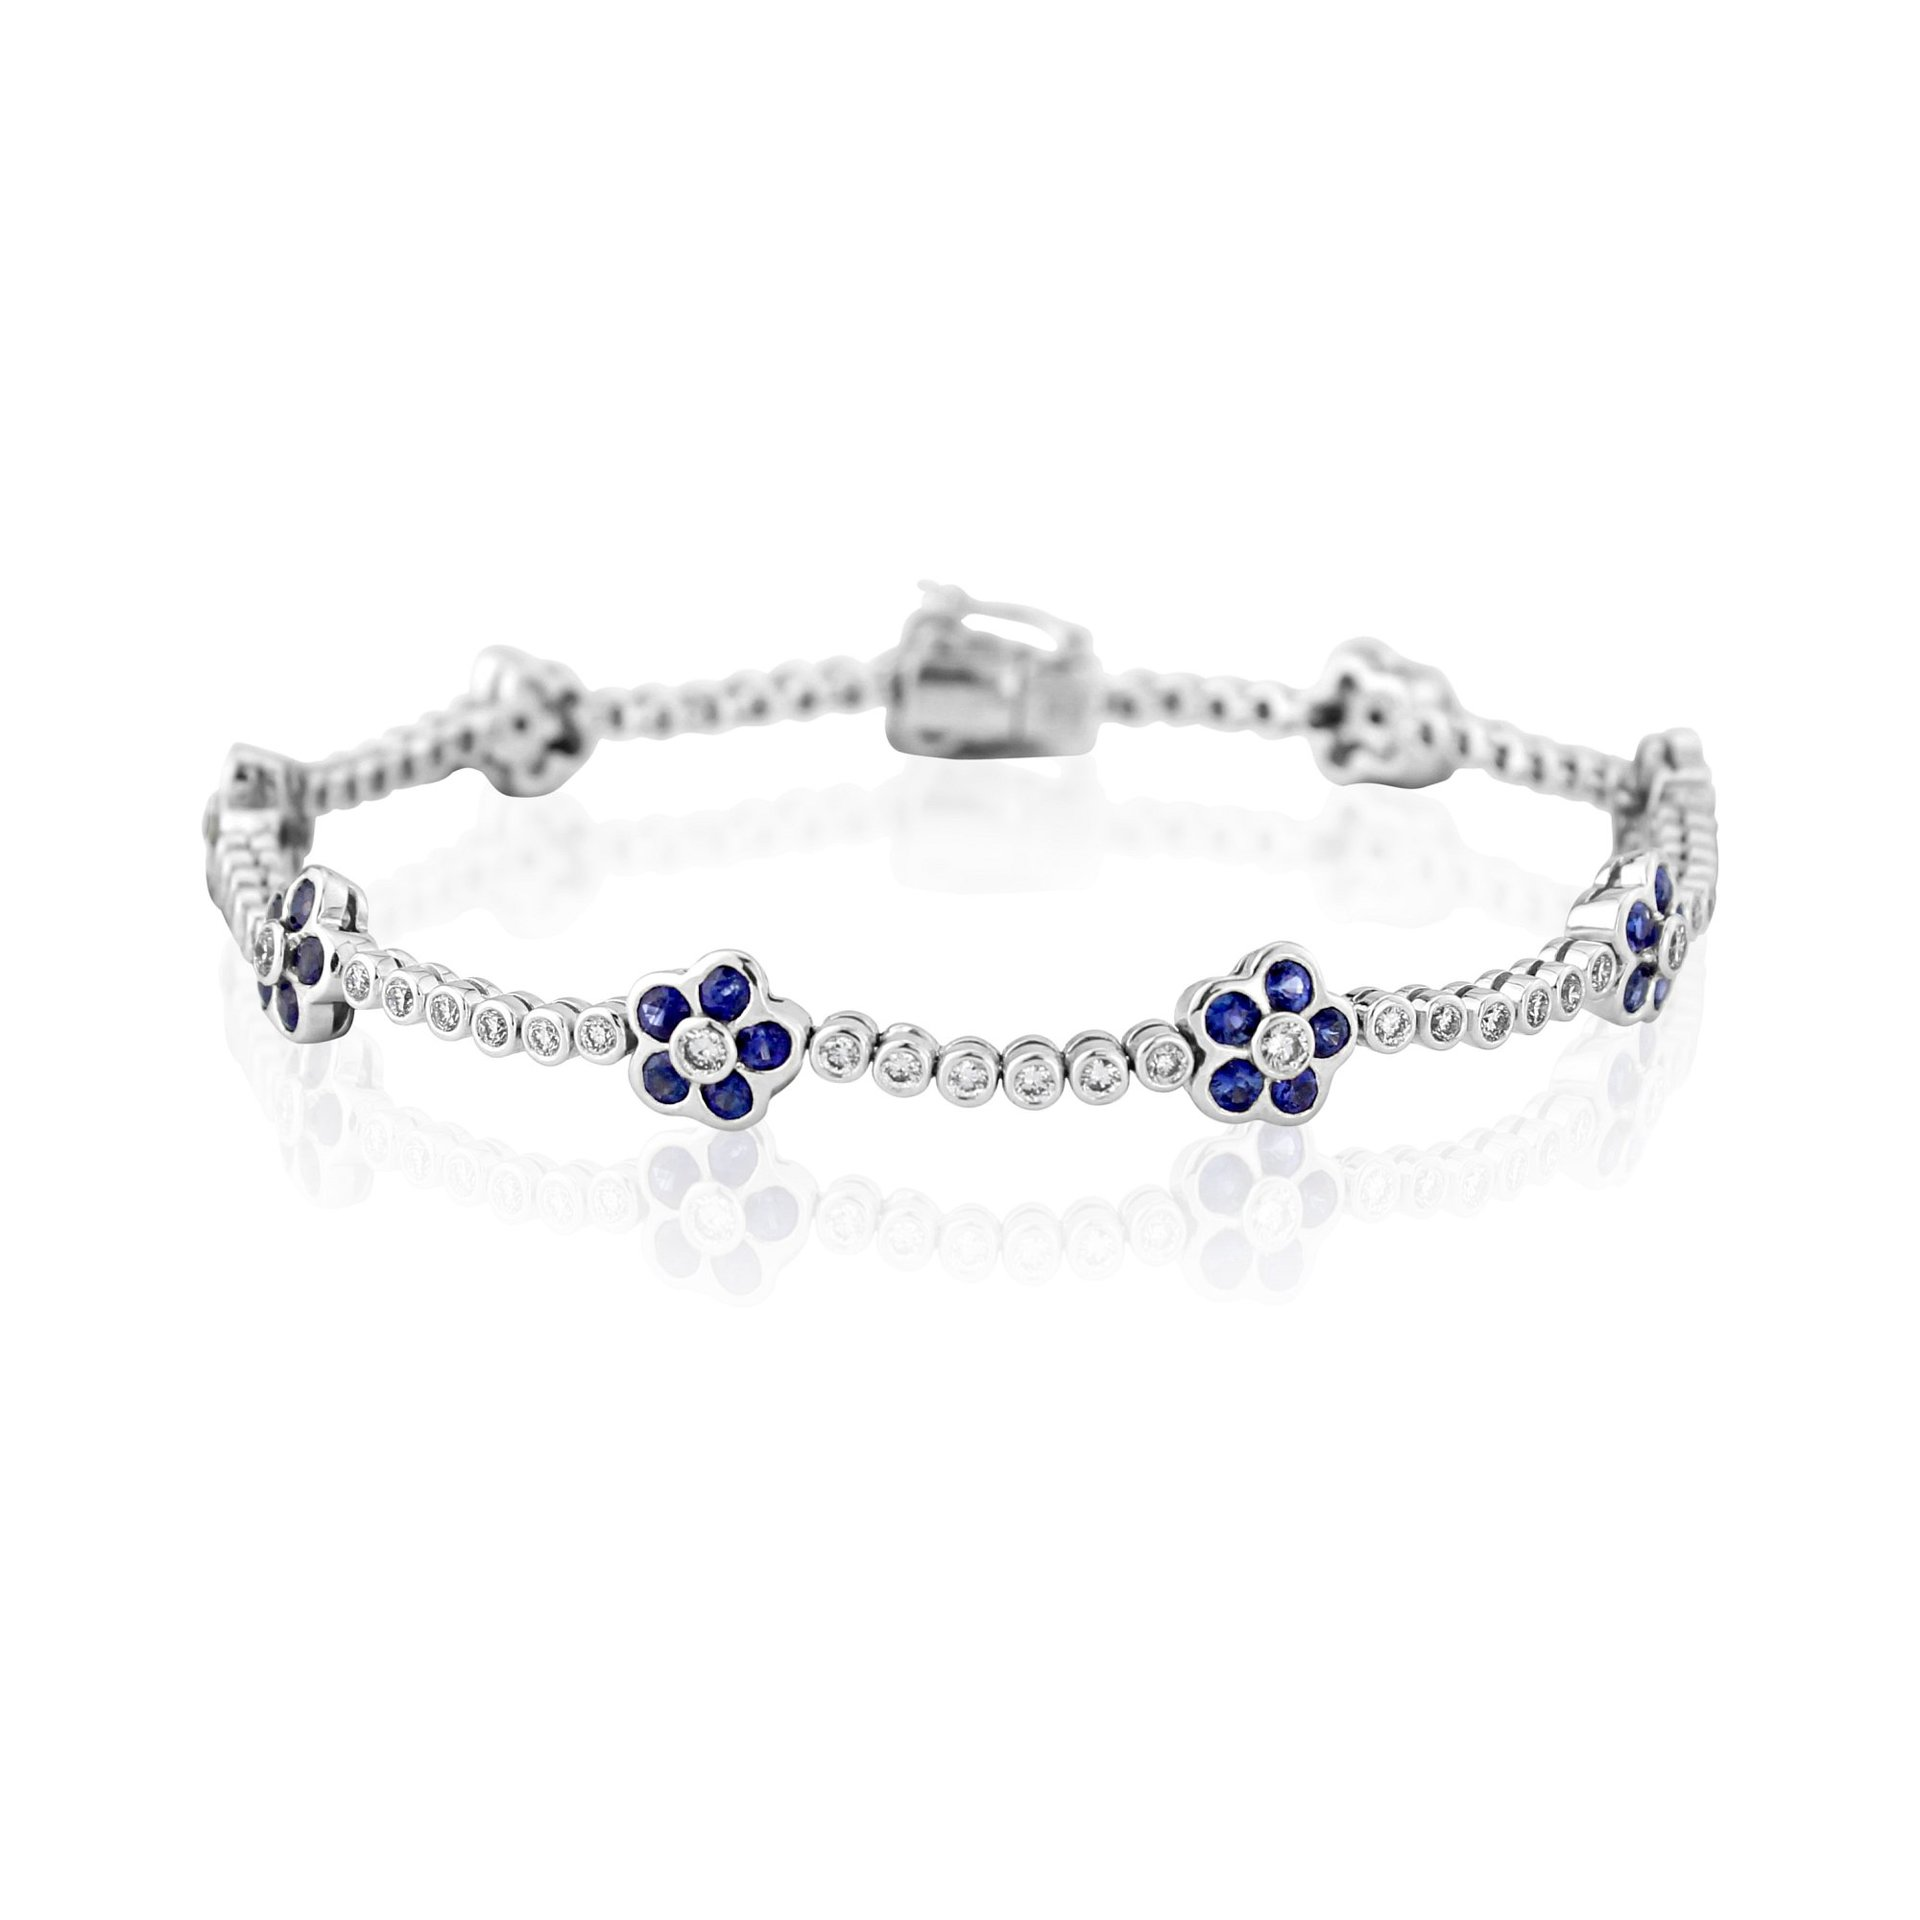 18ct White Gold Sapphire and Diamond Flower Bracelet